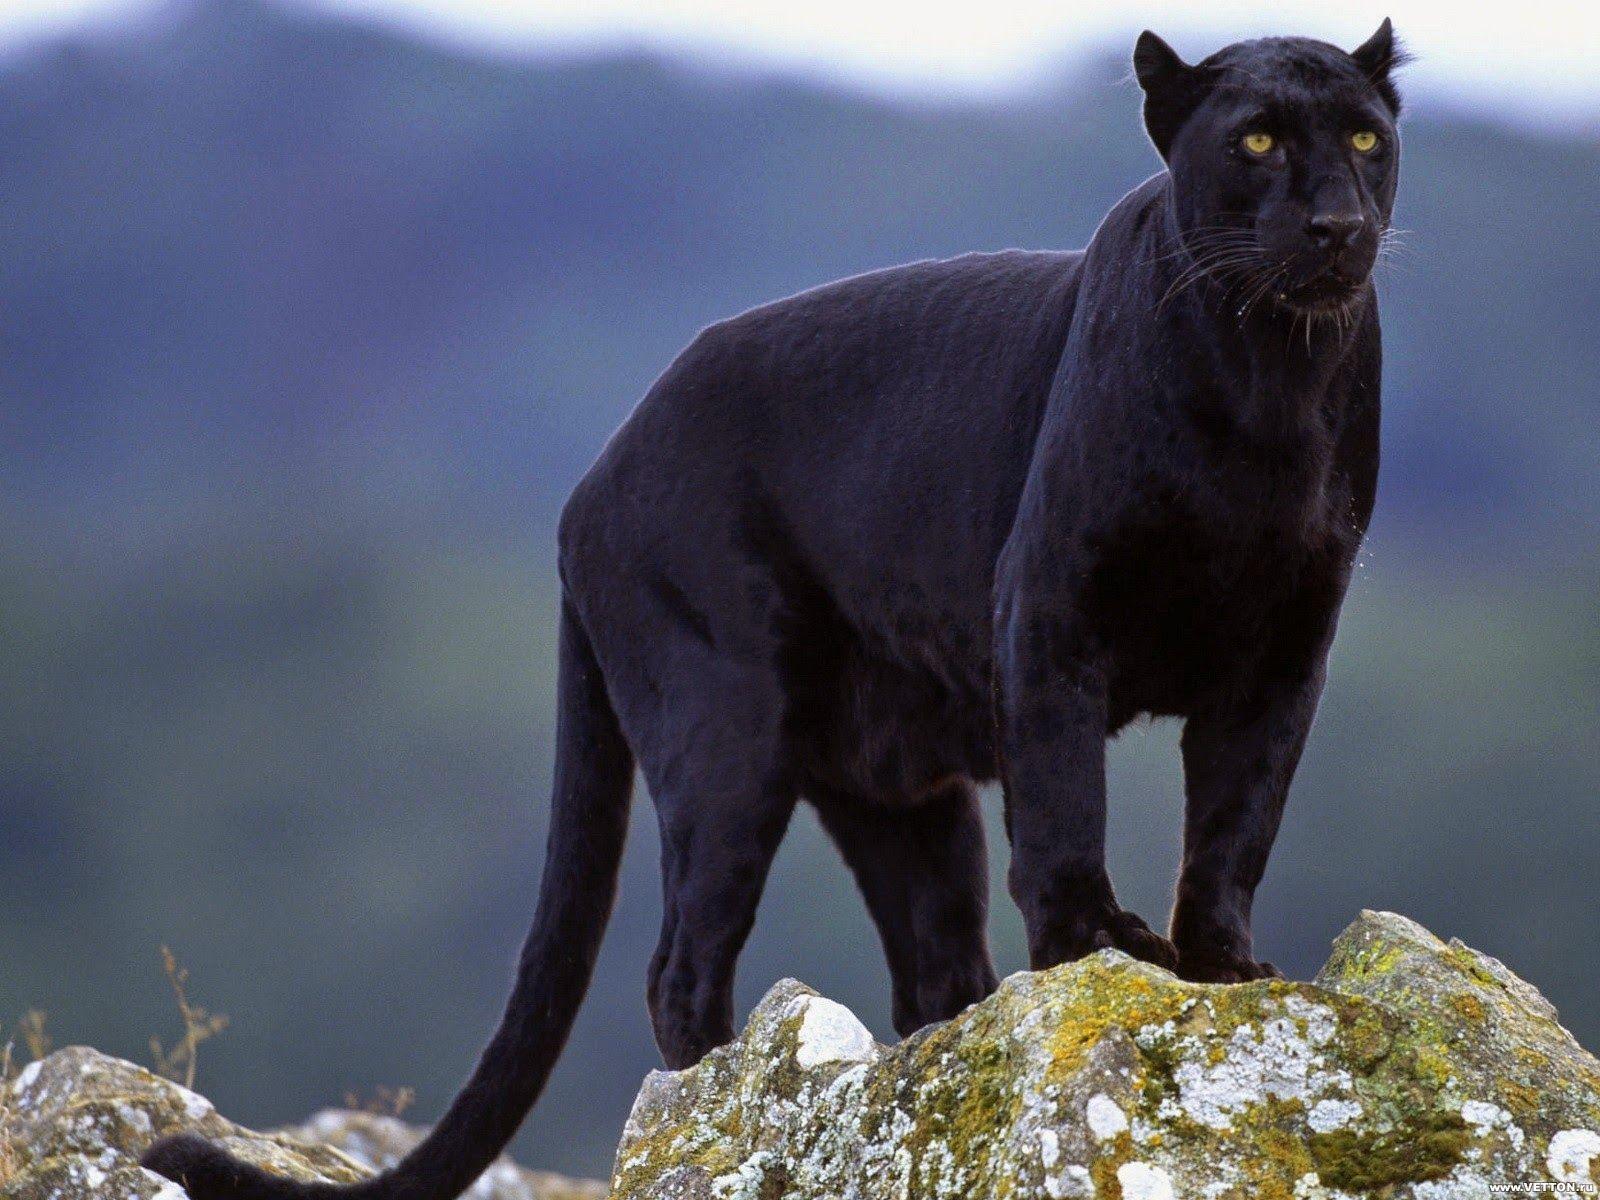 Puma Zwart Dier | Zwarte panter, Panter, Grote katten